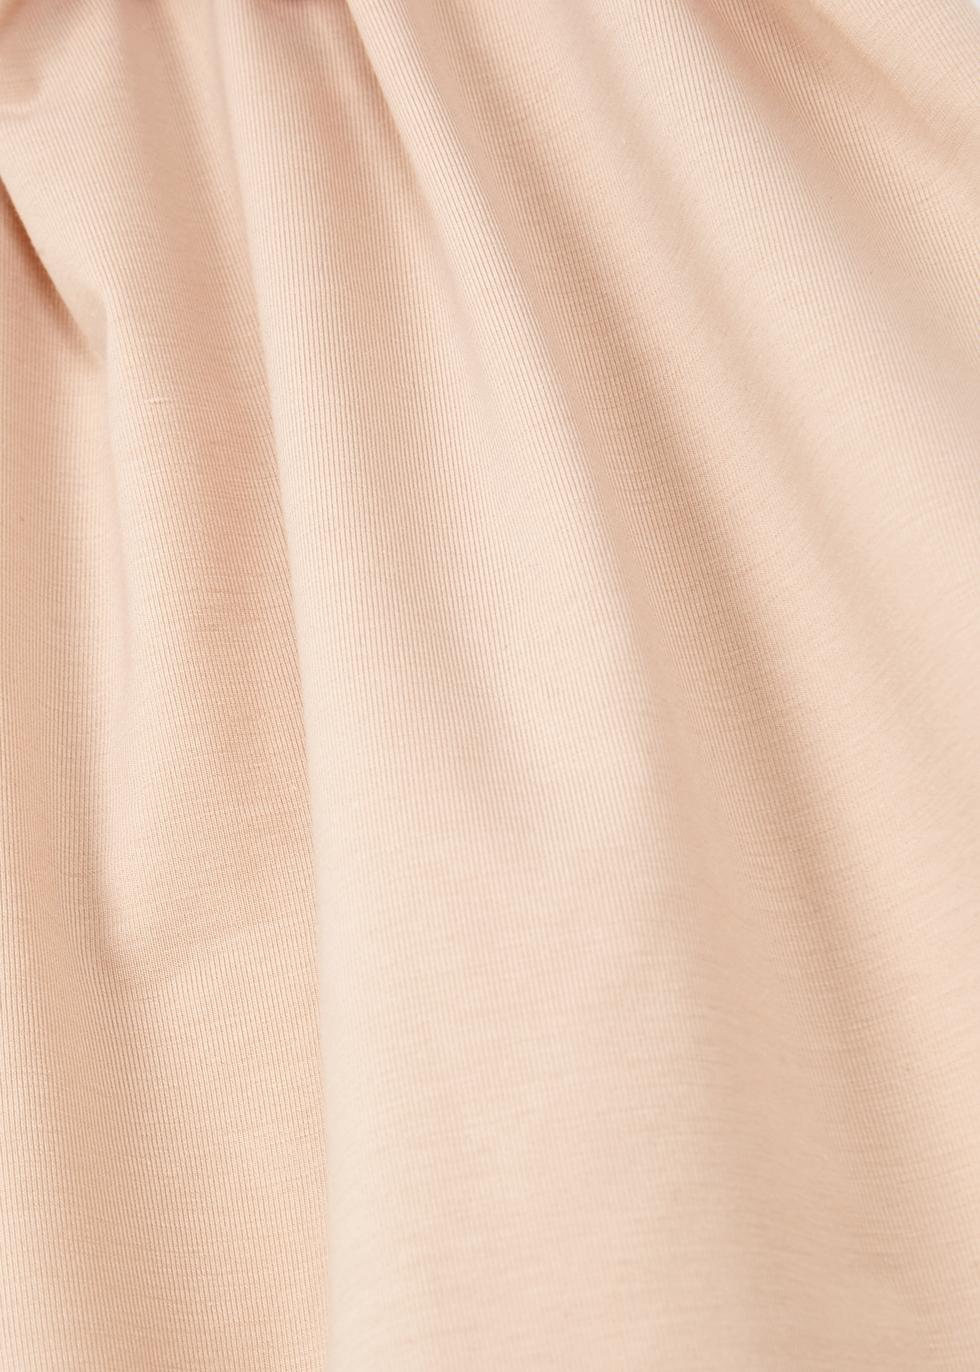 Beyond Naked almond shaping shorts - Wacoal